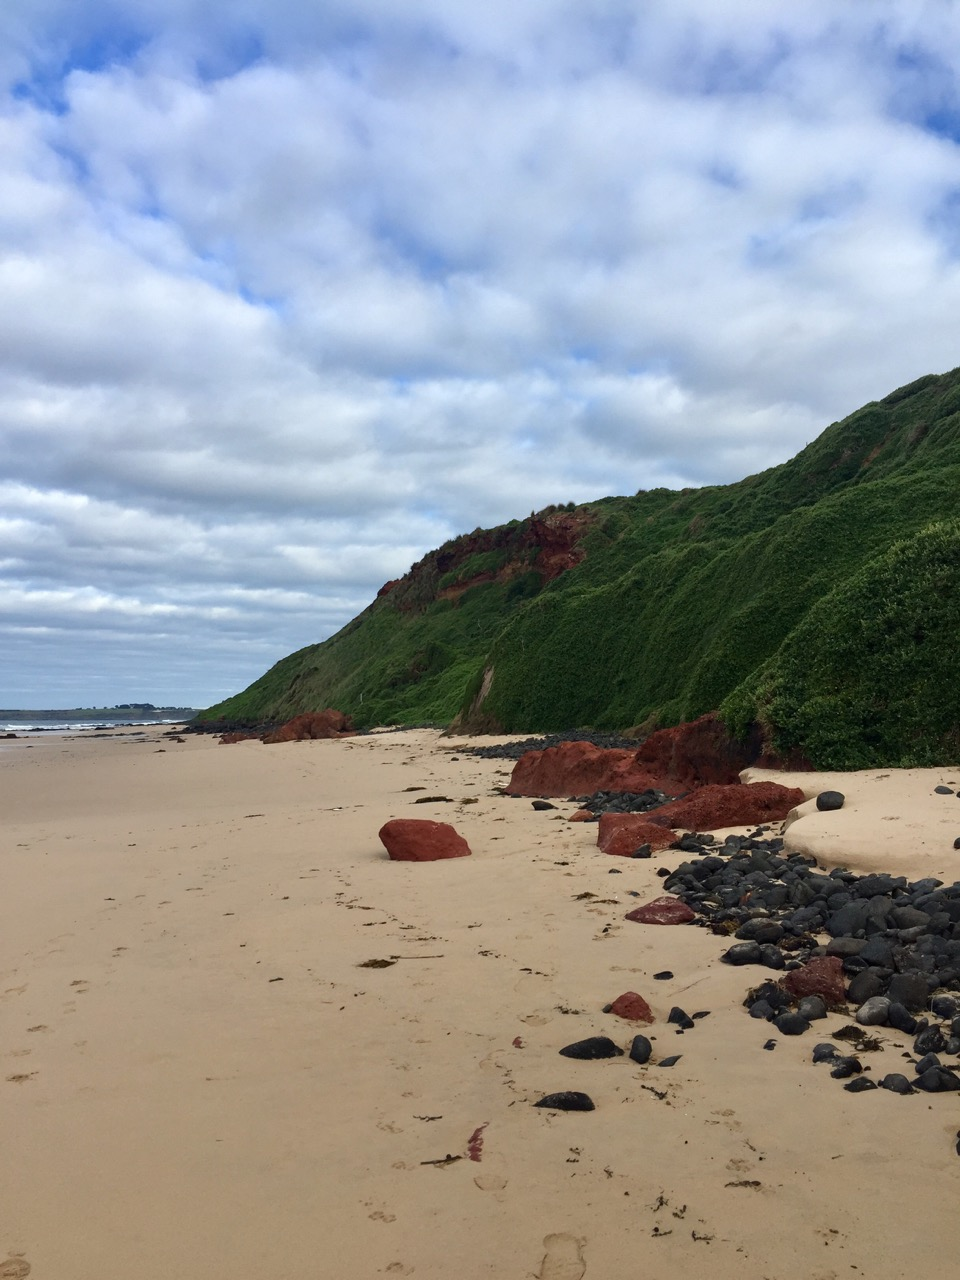 The colourful Surf Beach sand dunes.